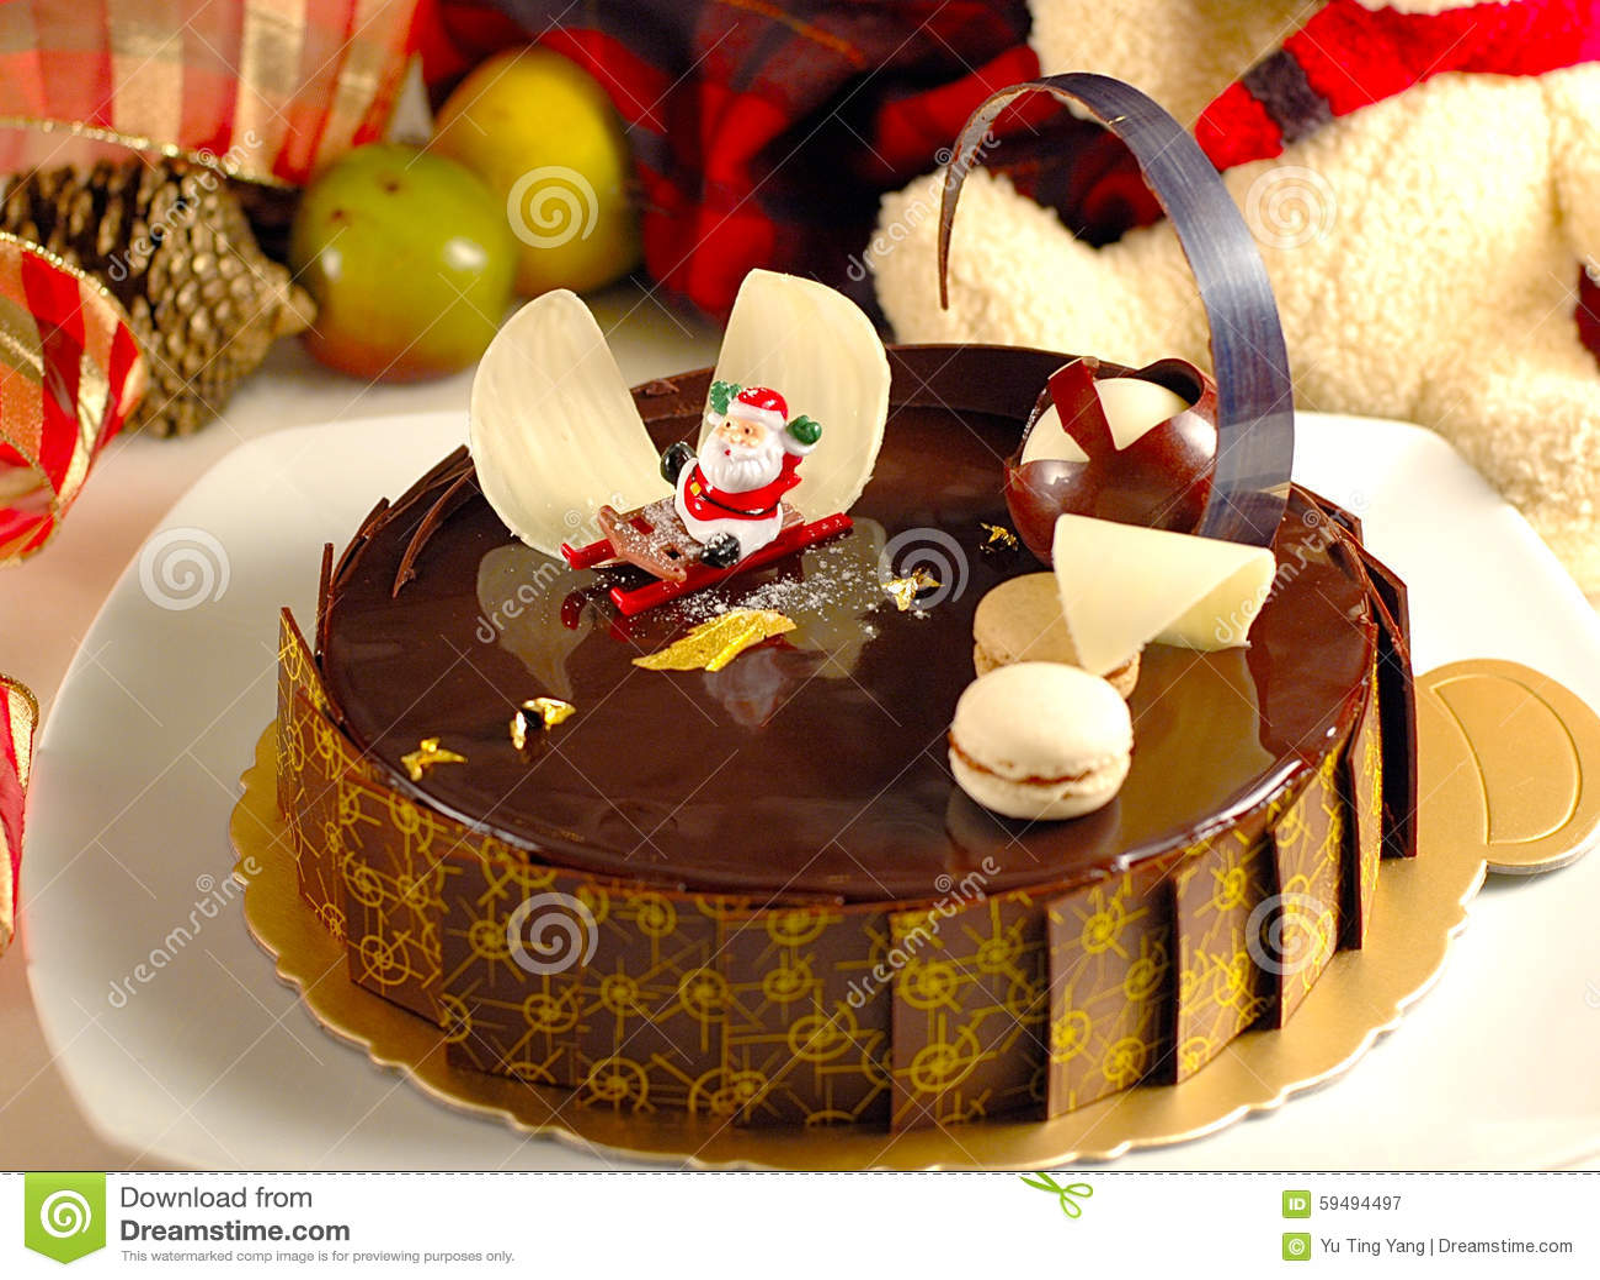 merry christmas cake pic